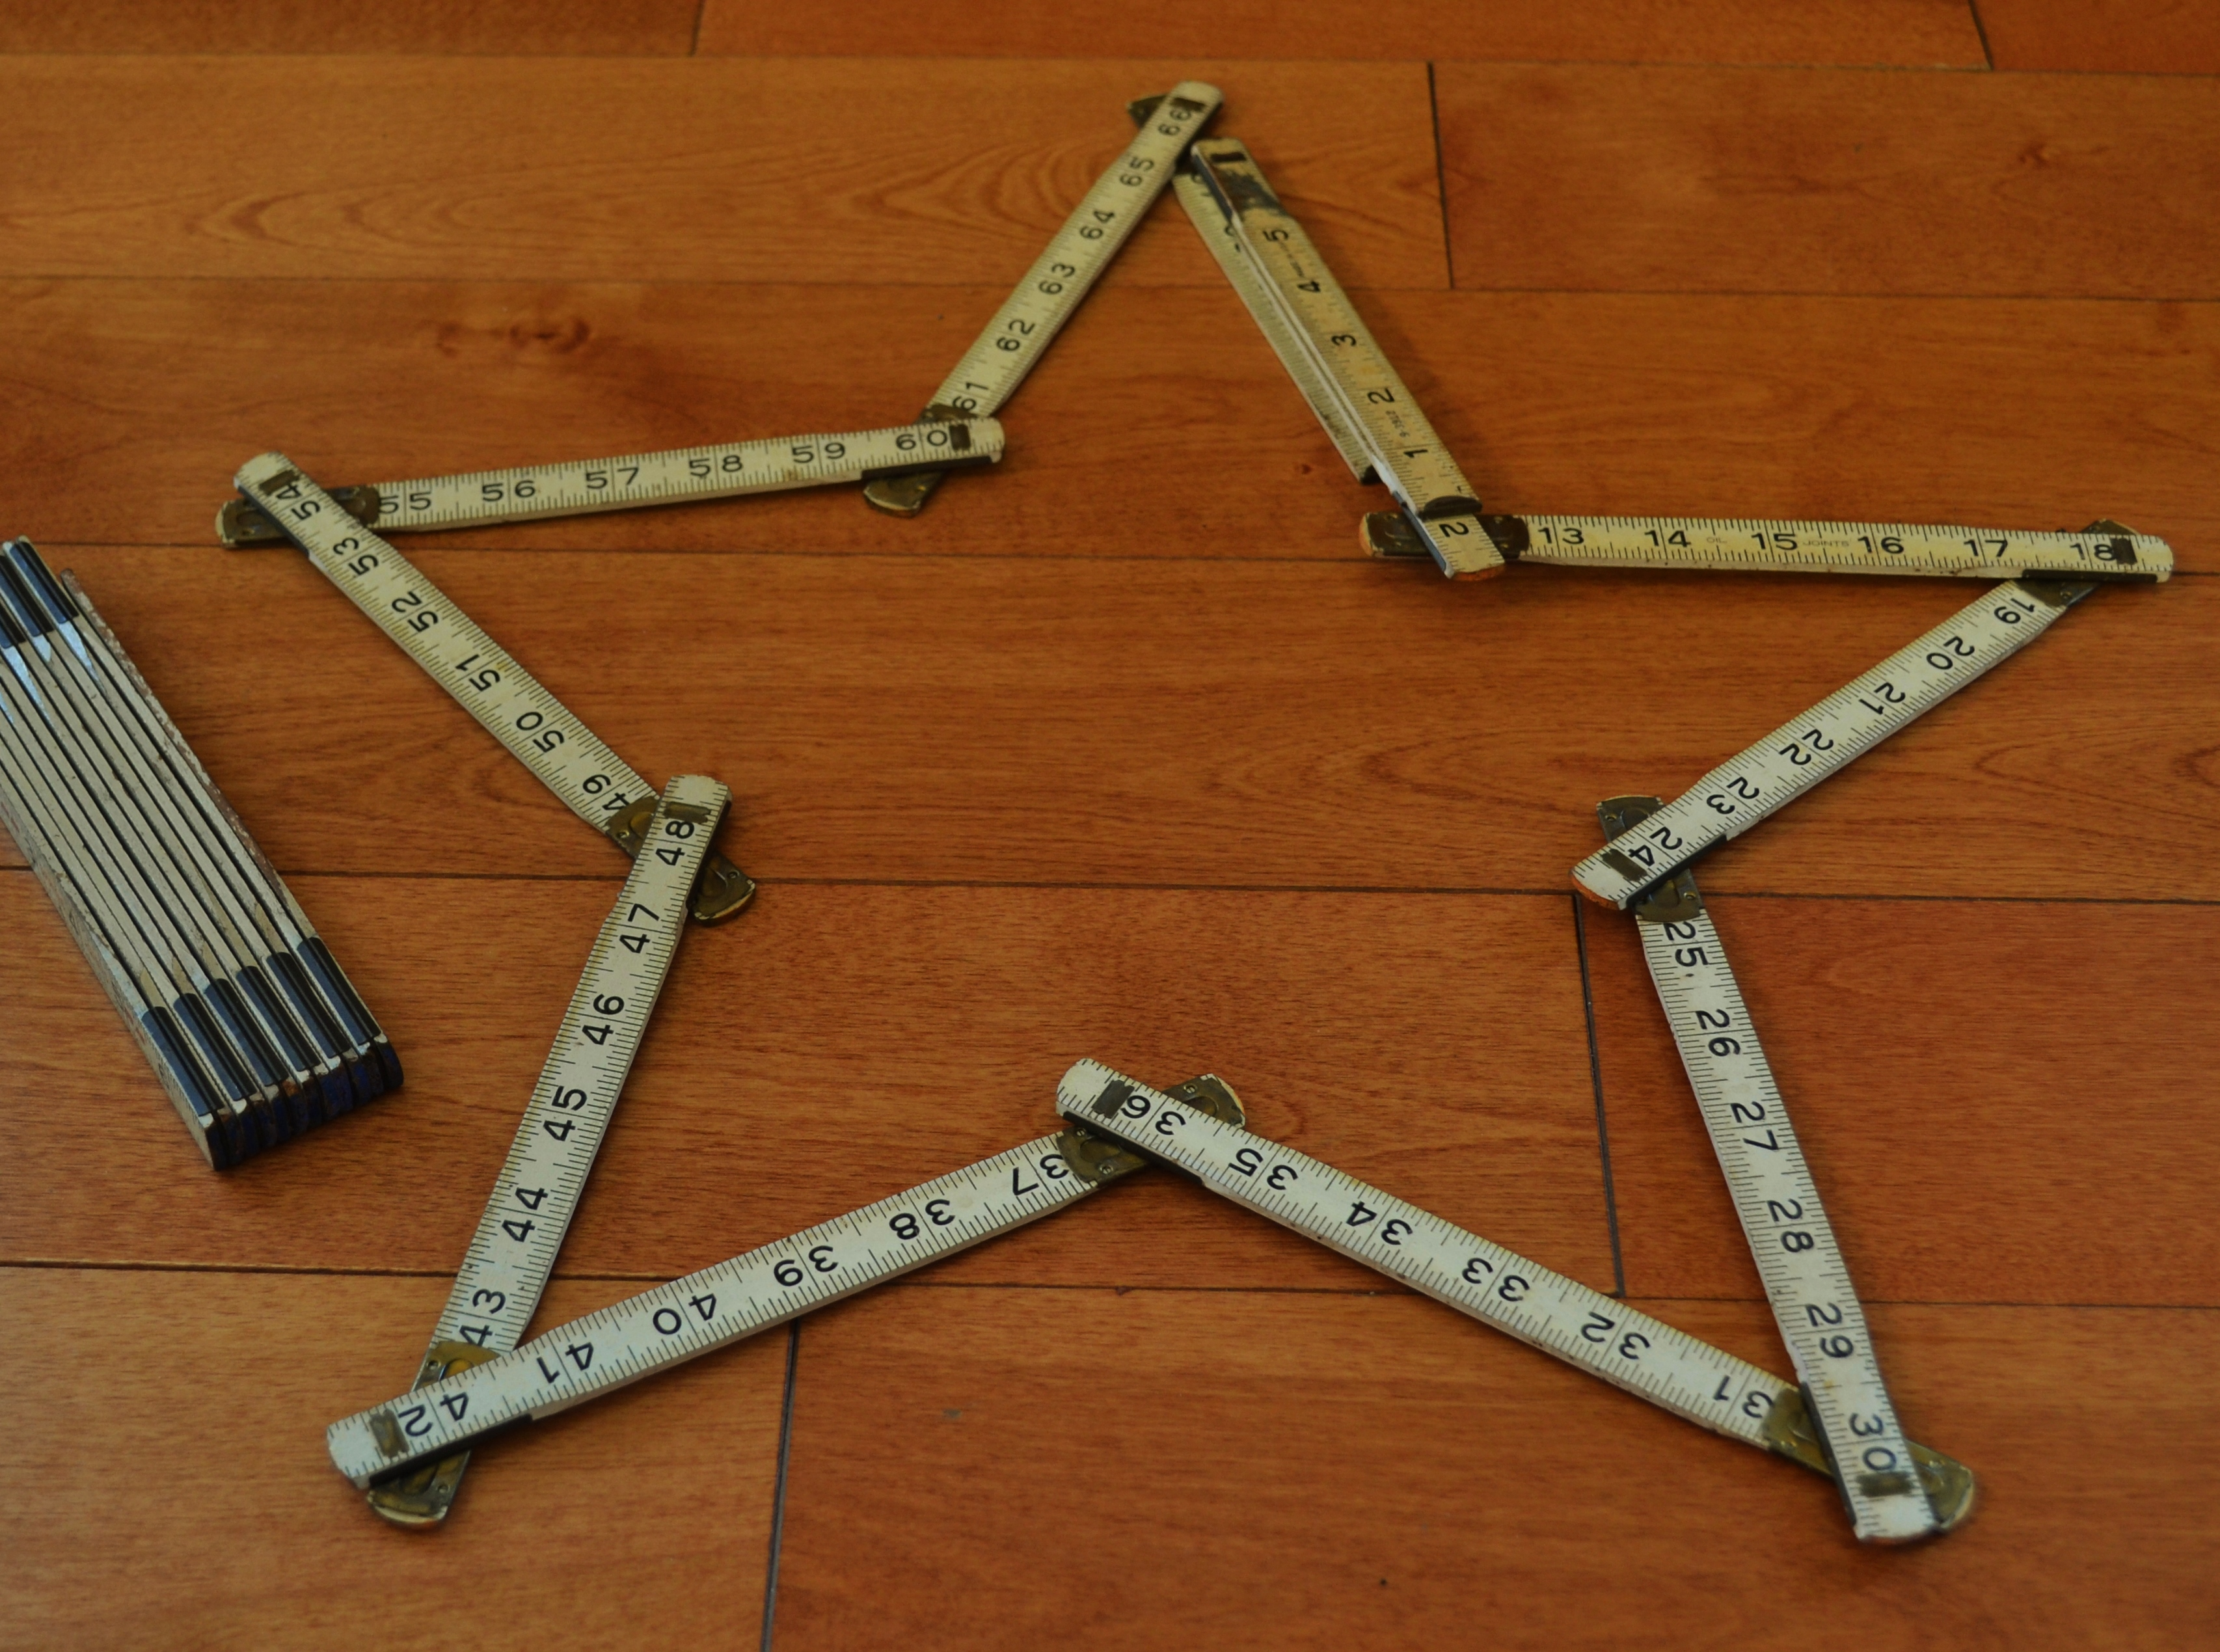 articulated ruler